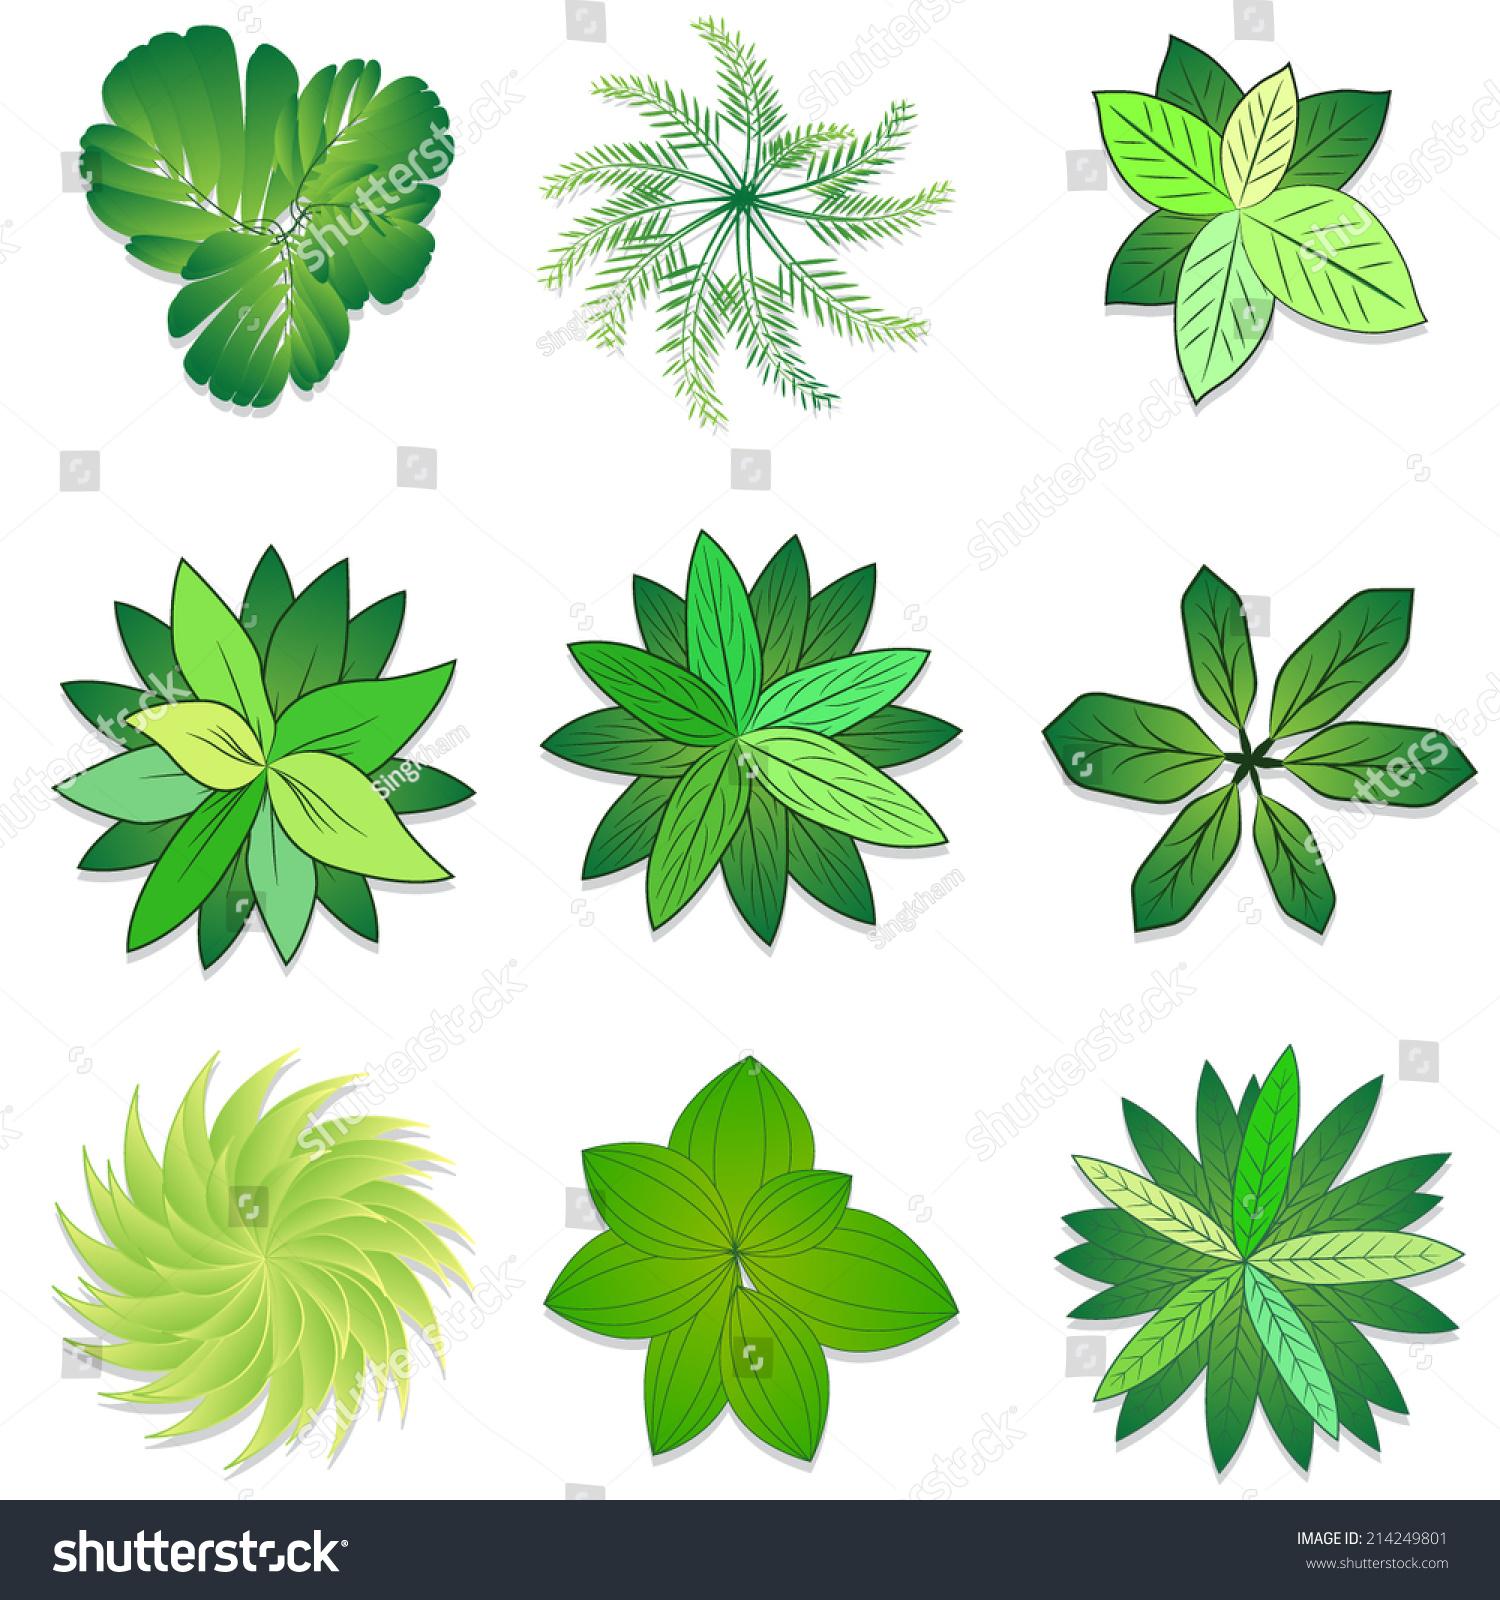 Garden Stock Image Image Of Design: Trees, Plant , Flower ,Item Top View For Garden Landscape